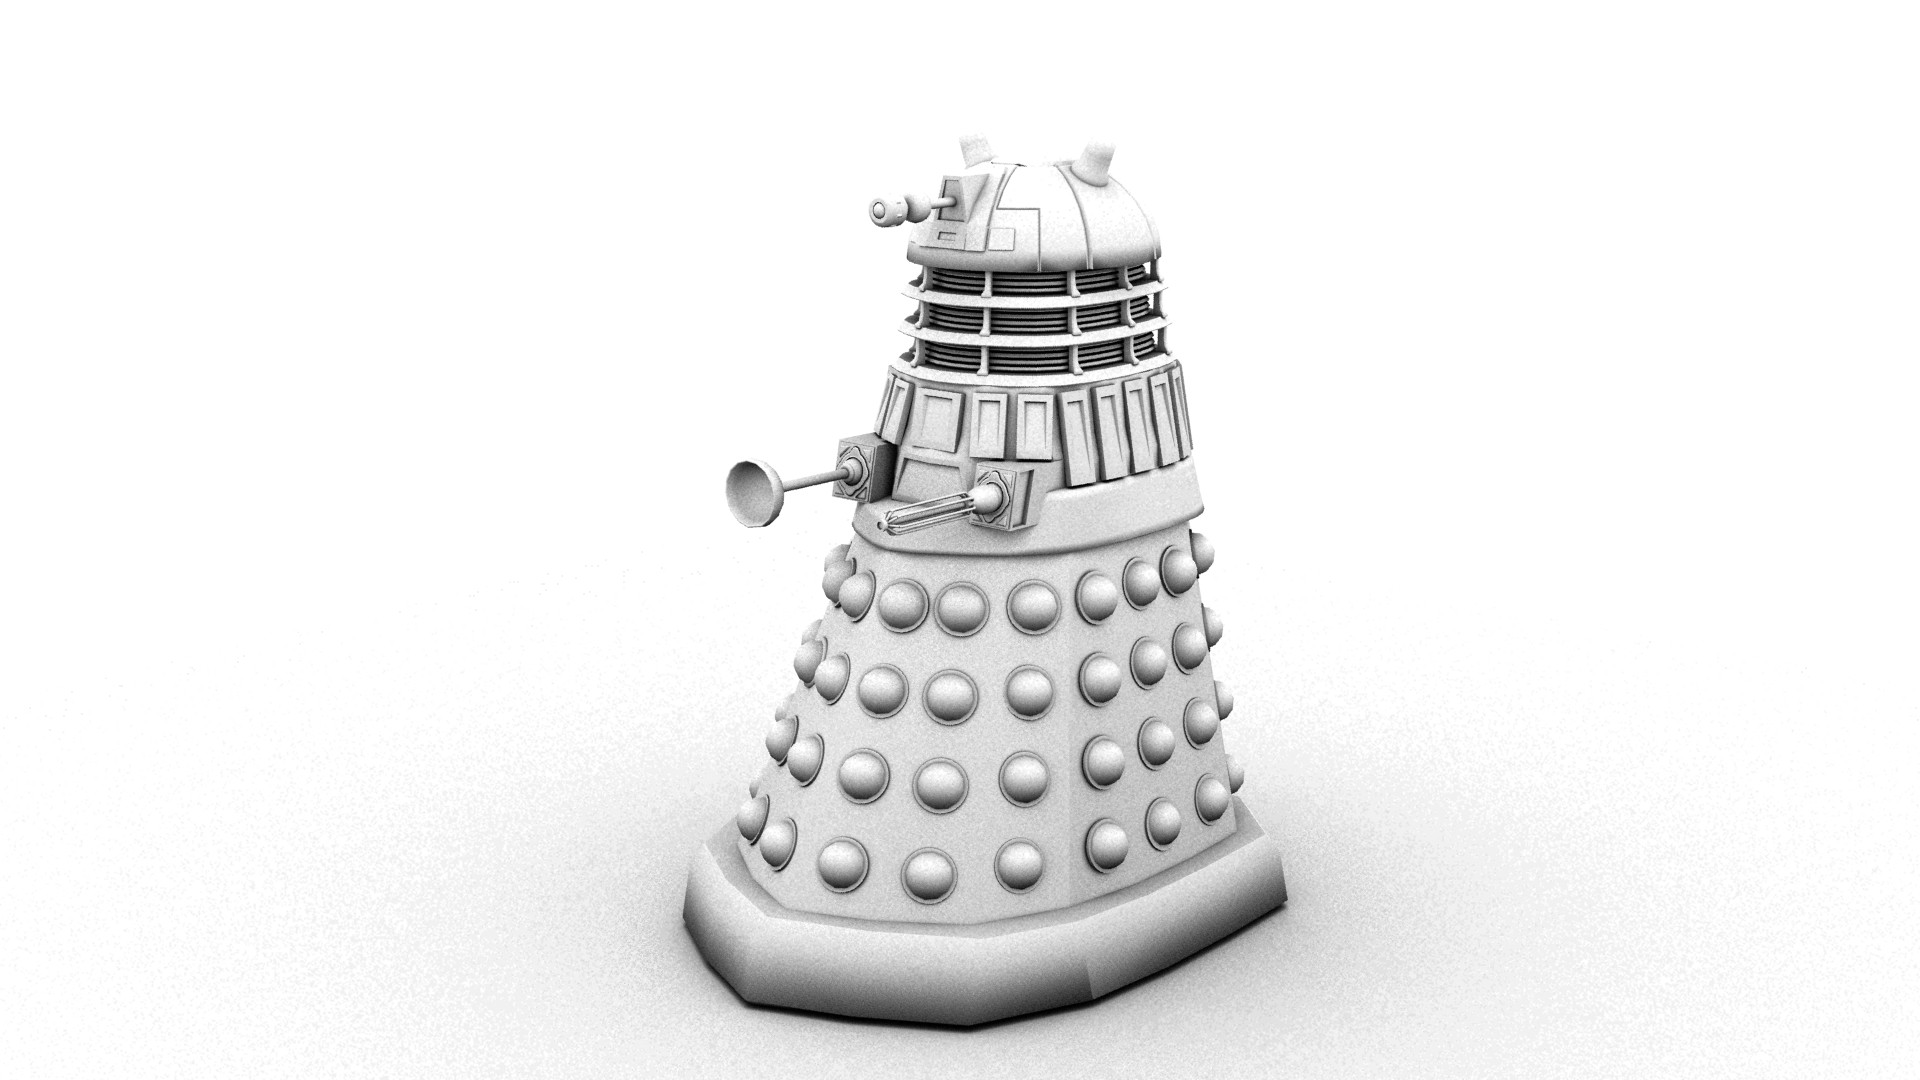 Dalek_lowpoly.jpg